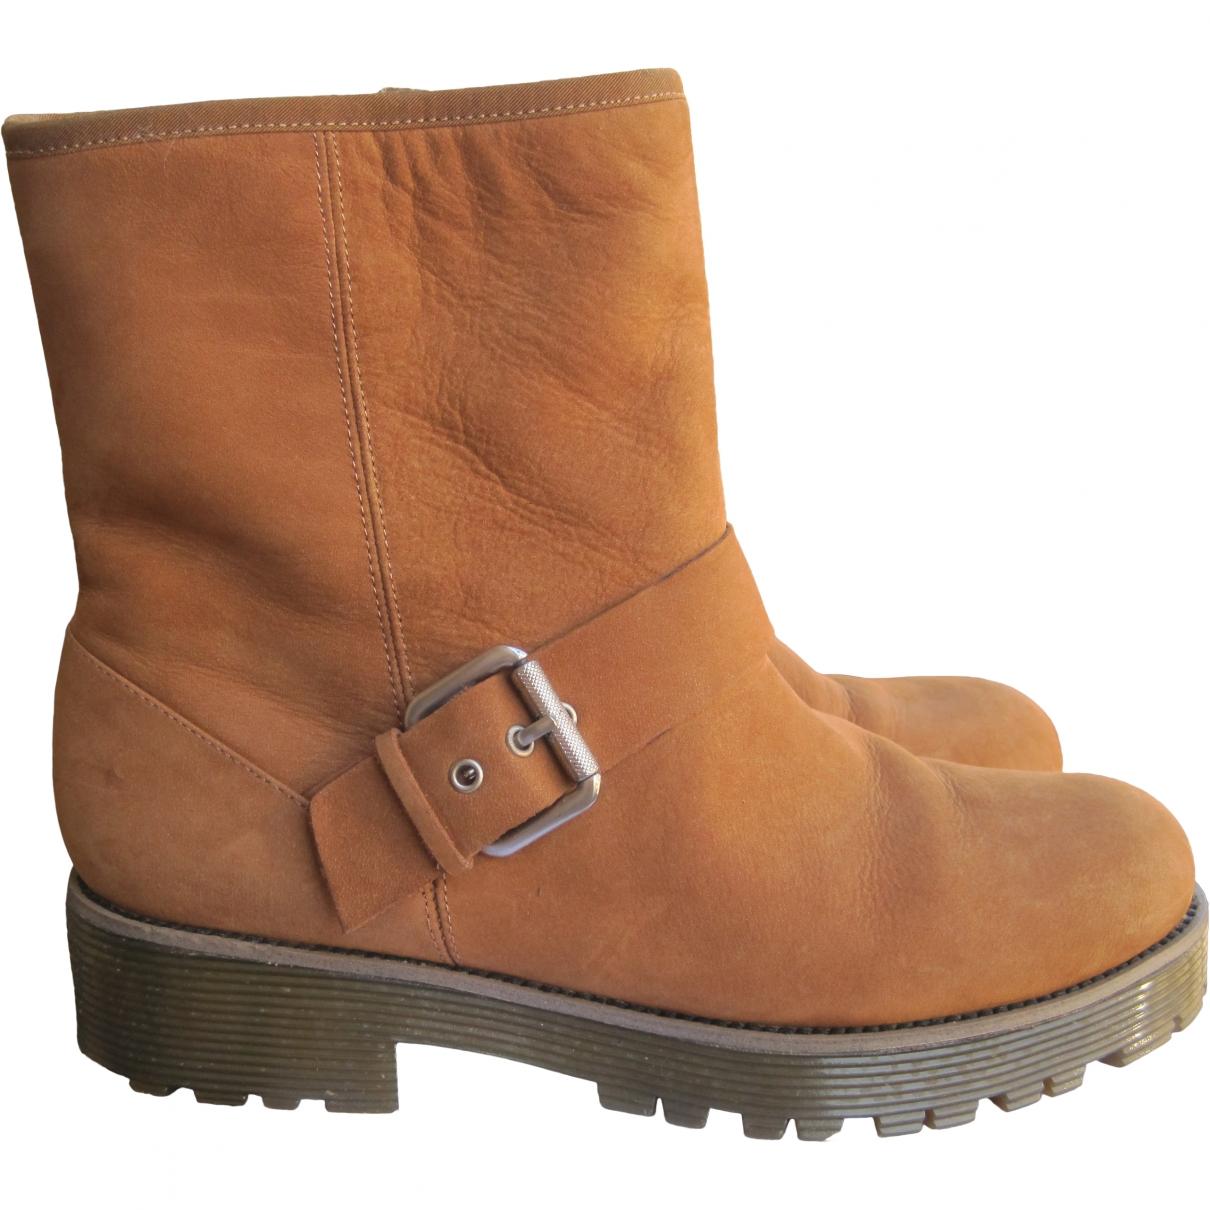 Kurt Geiger \N Camel Suede Ankle boots for Women 38 EU